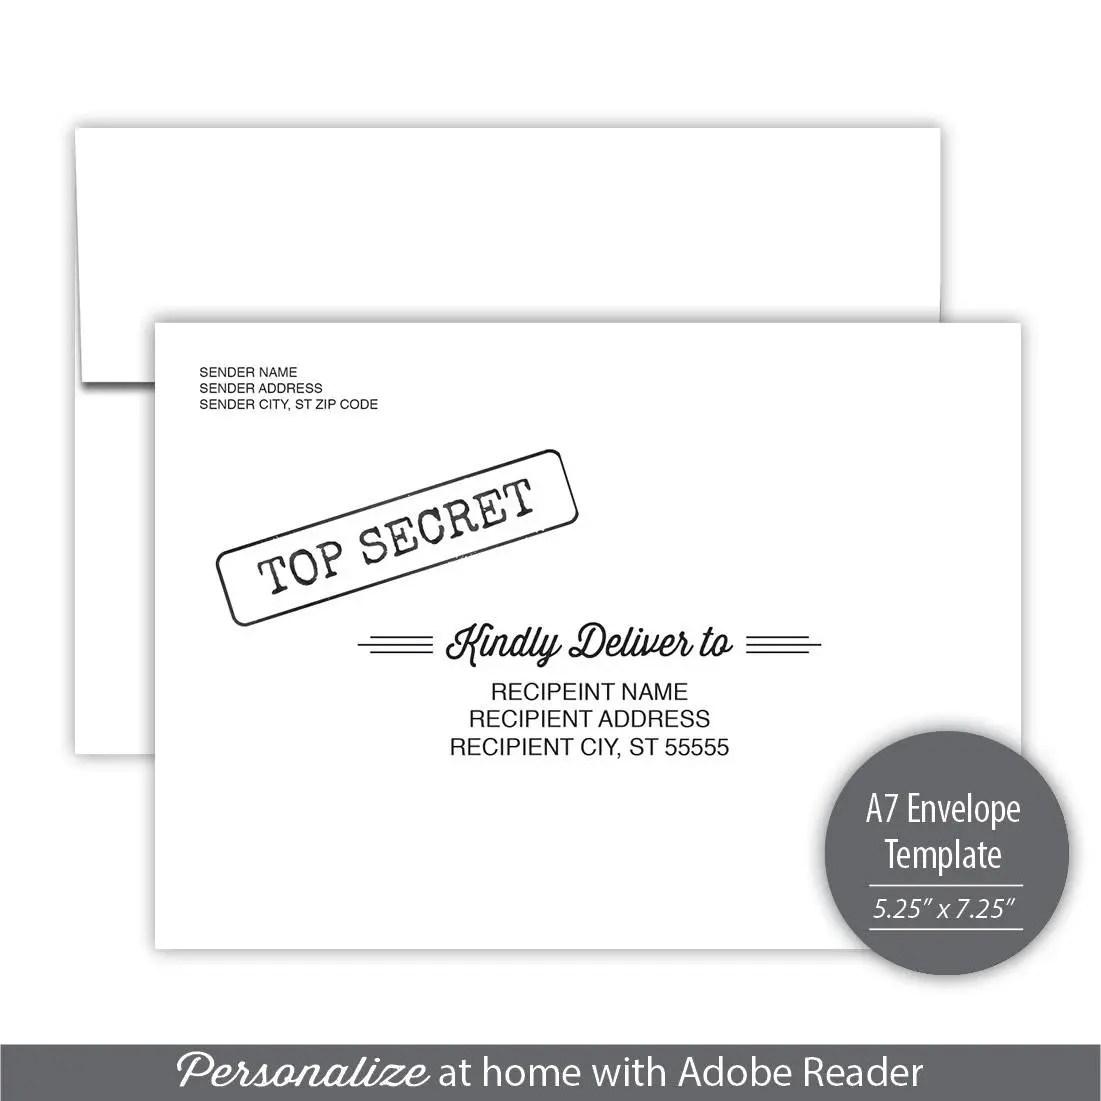 Top Secret A7 Envelope Template Instant Download Etsy